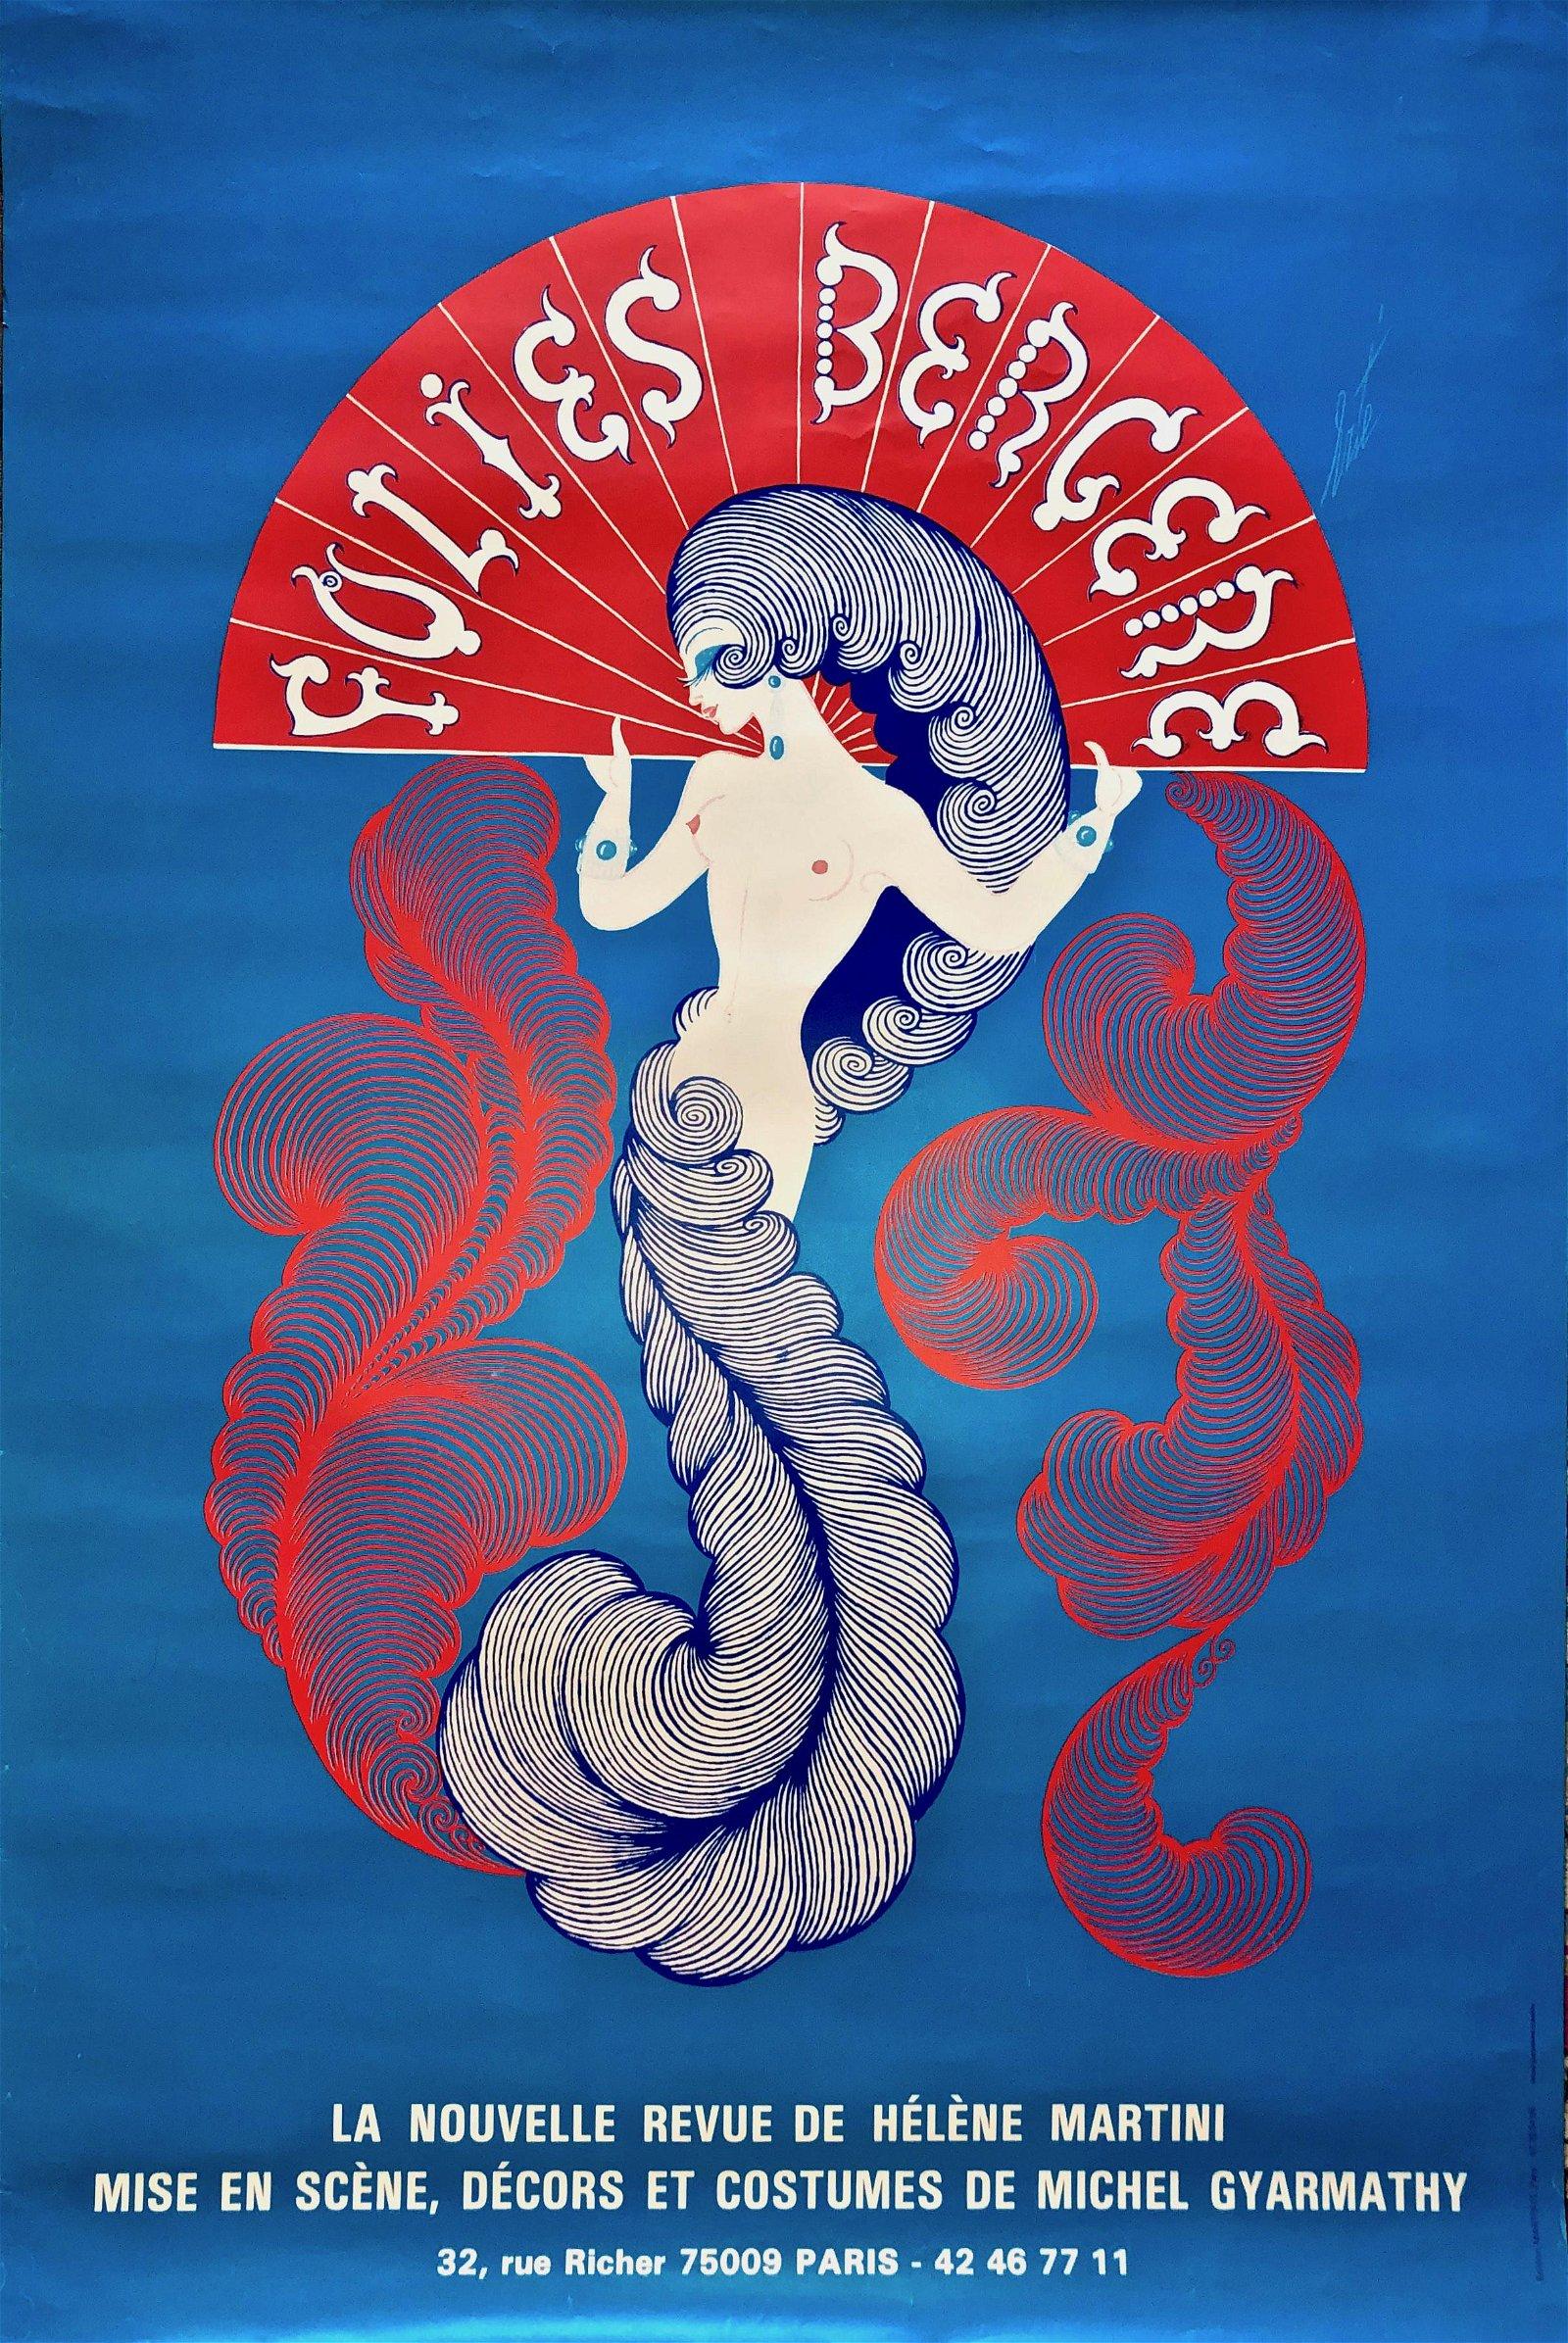 Folies Bergere Cabaret Advertising Poster, Erte 1970